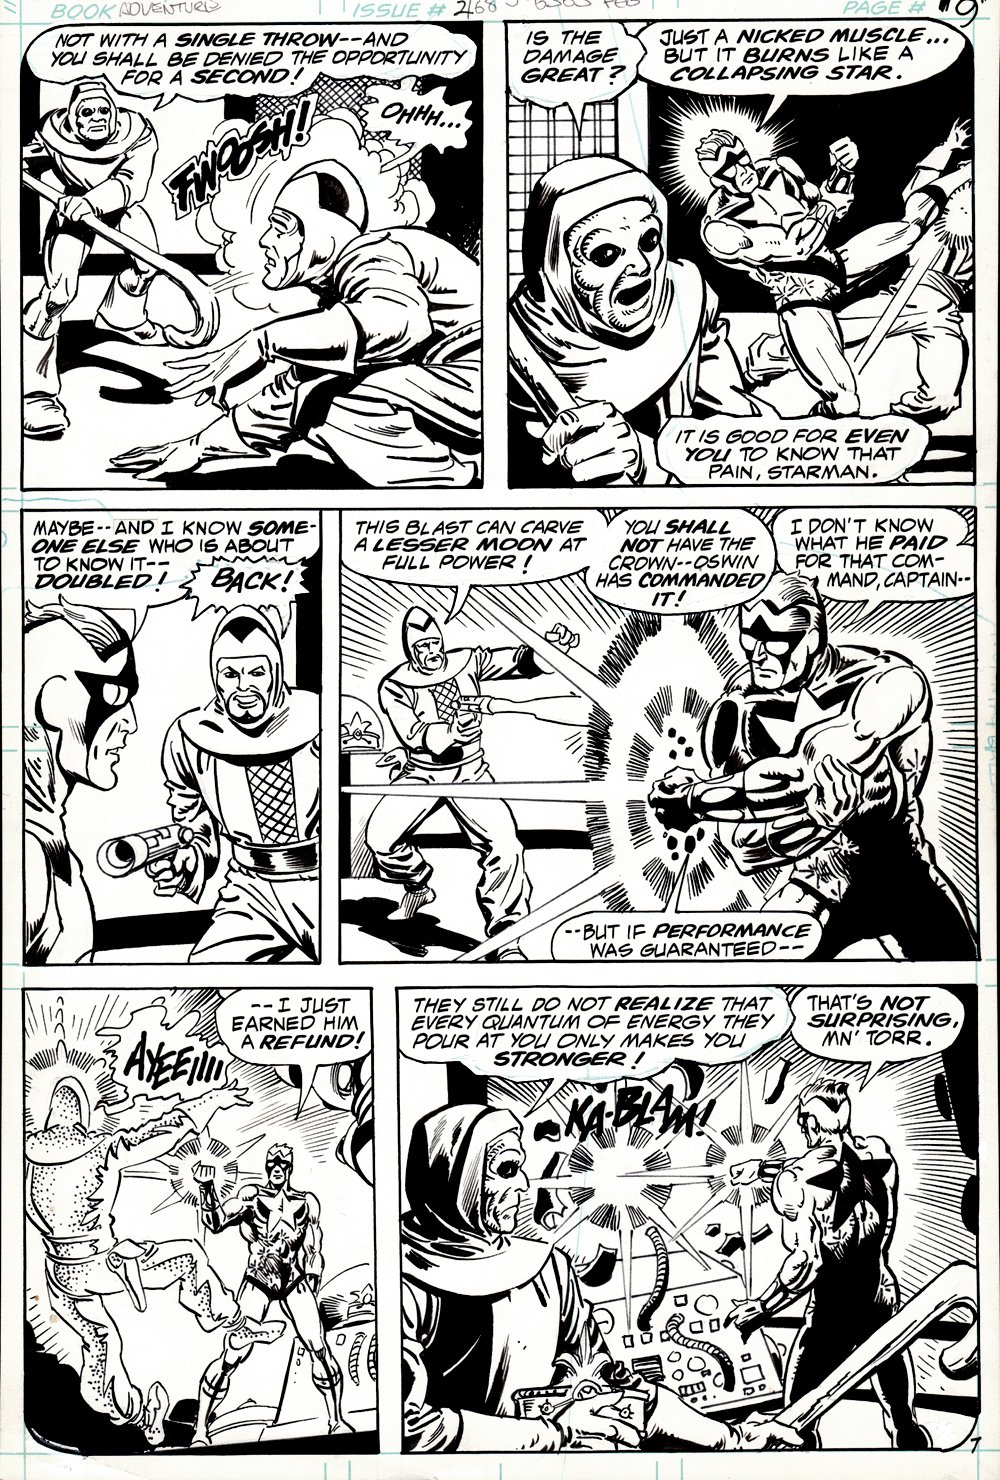 Adventure Comics #468 p 7 (STEVE DITKO BRONZE AGE 'STARMAN' BATTLE PAGE! 1979